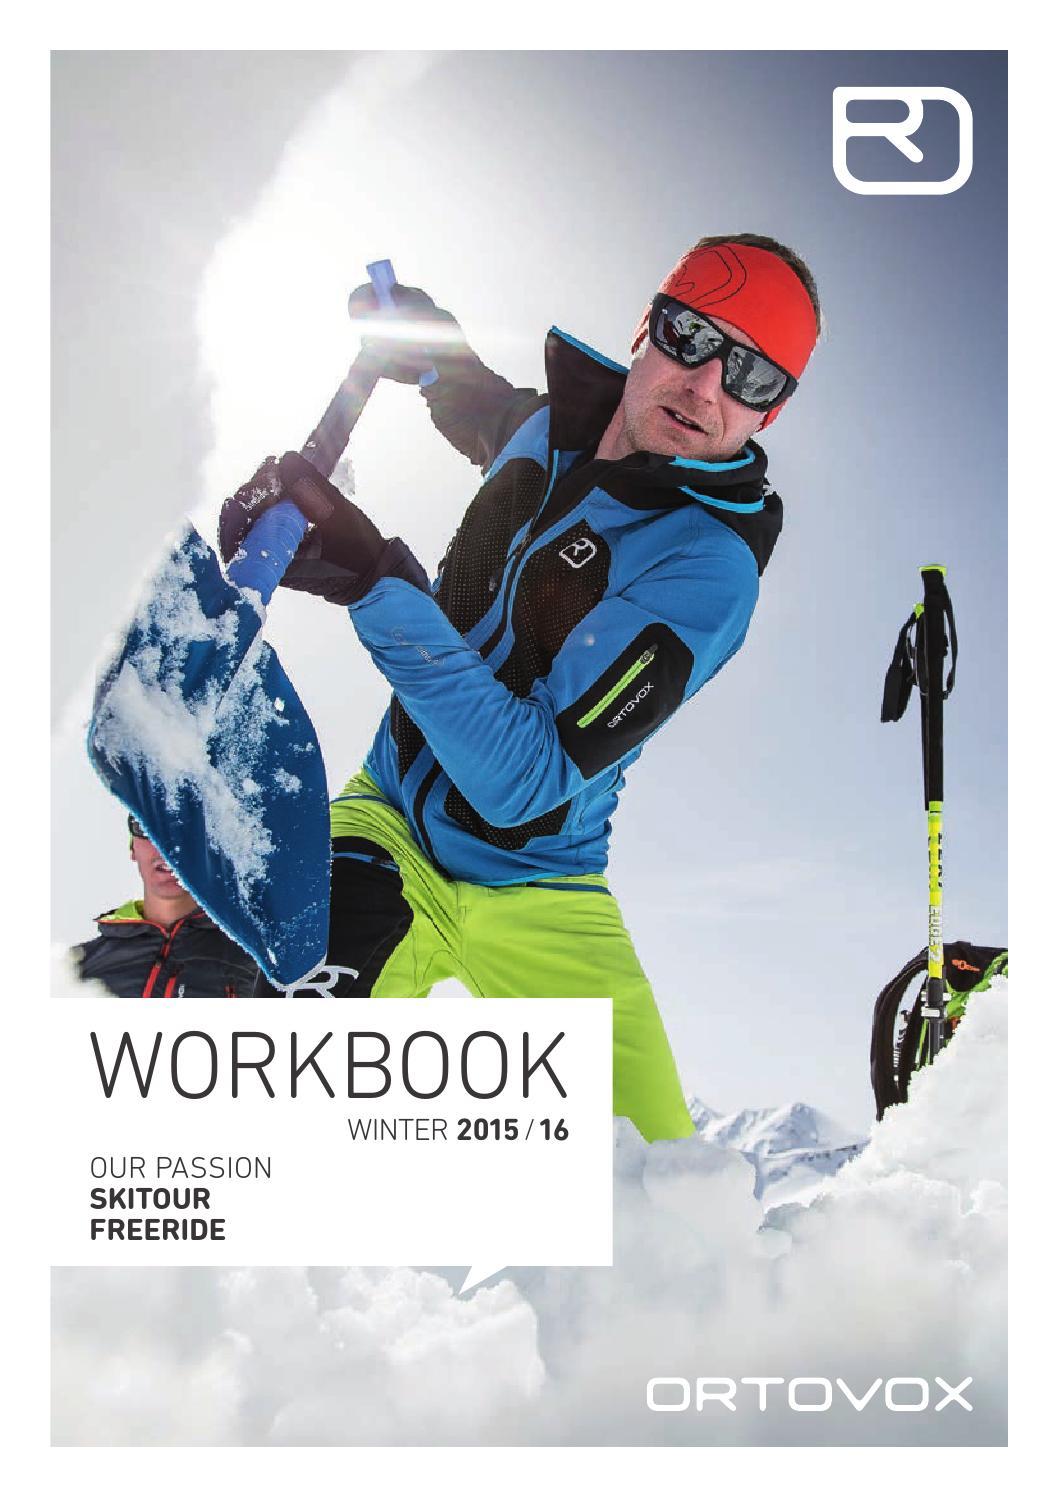 738aecf506a0 Workbook Winter 2015-16 EN by ORTOVOX - issuu